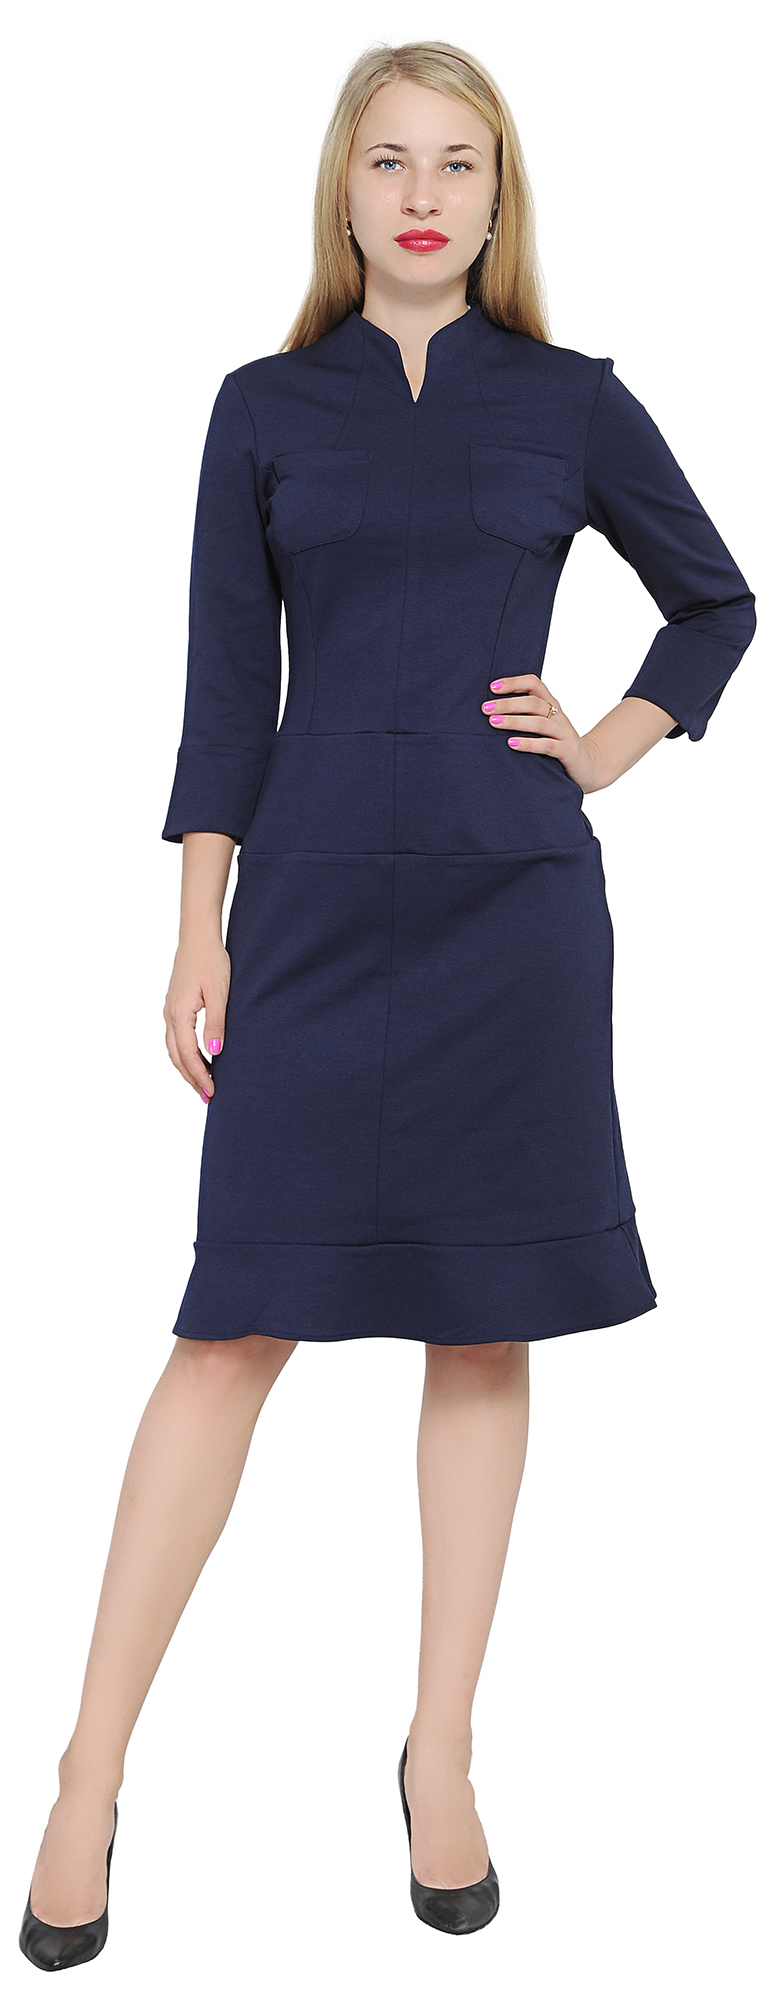 MARYCRAFTS WOMEN'S MODEST CASUAL OFFICE WORK BUSINESS DRESS SHEATH ...